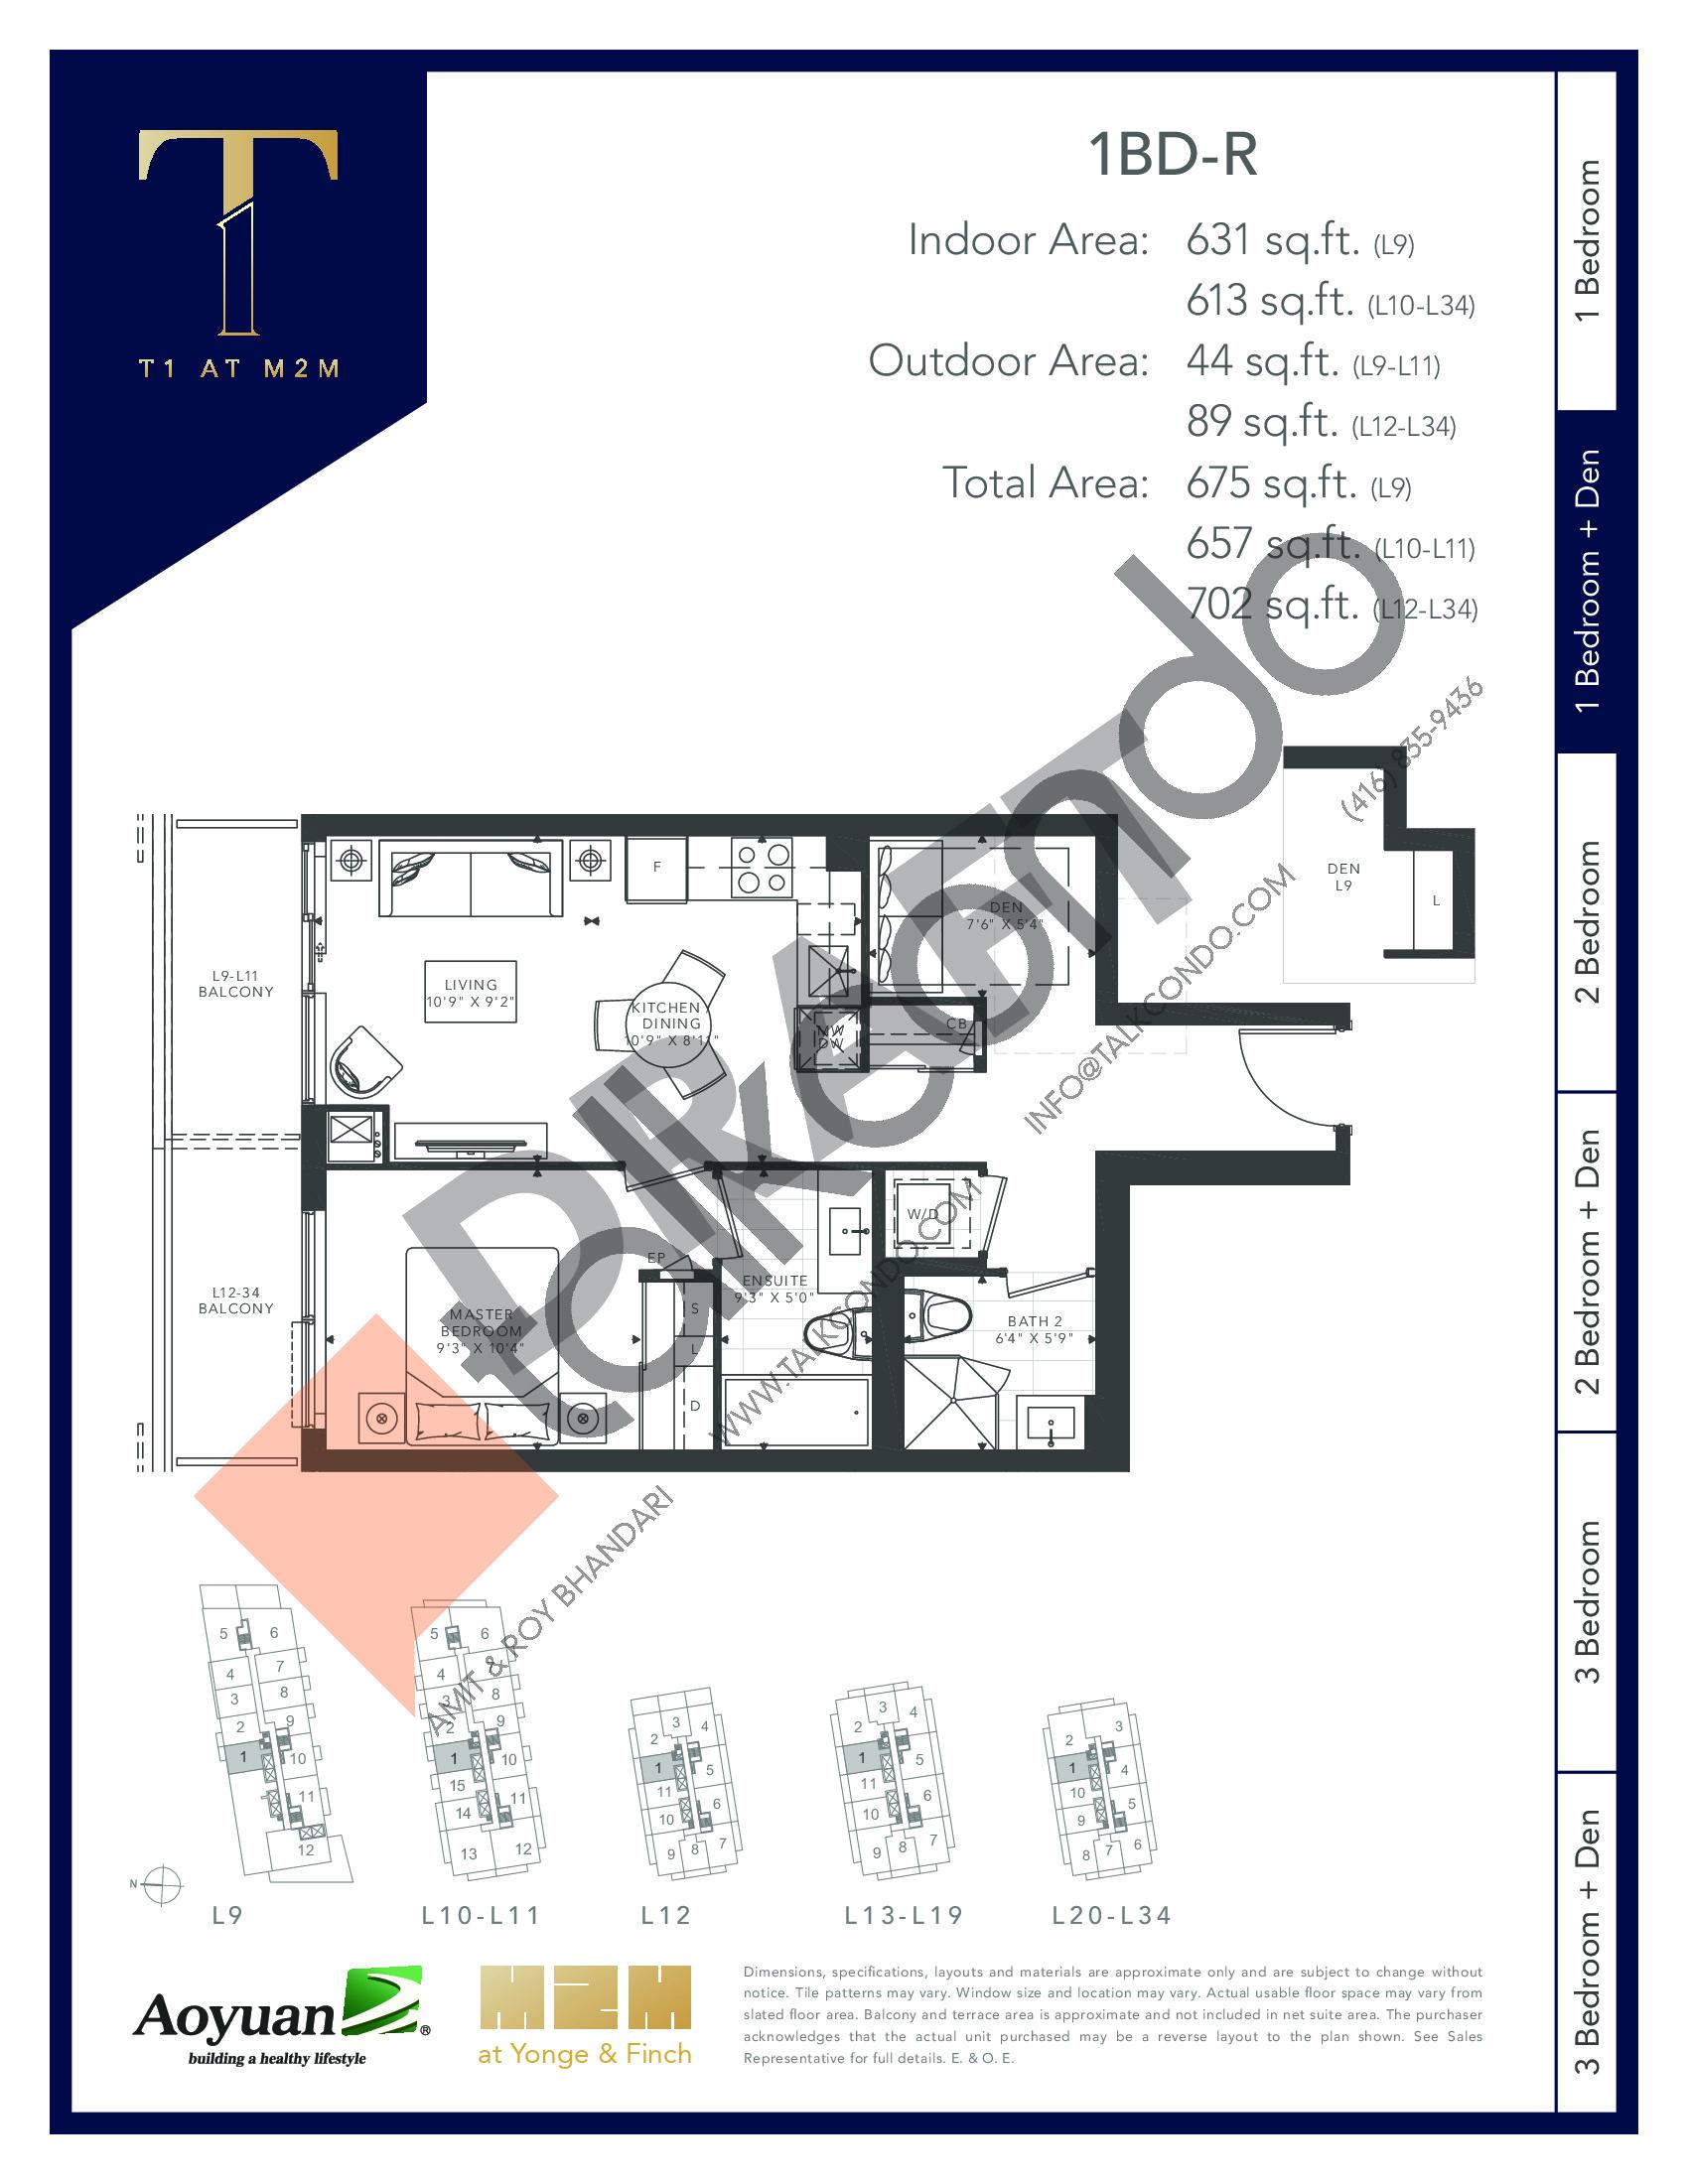 1BD-R (Tower) Floor Plan at T1 at M2M Condos - 631 sq.ft